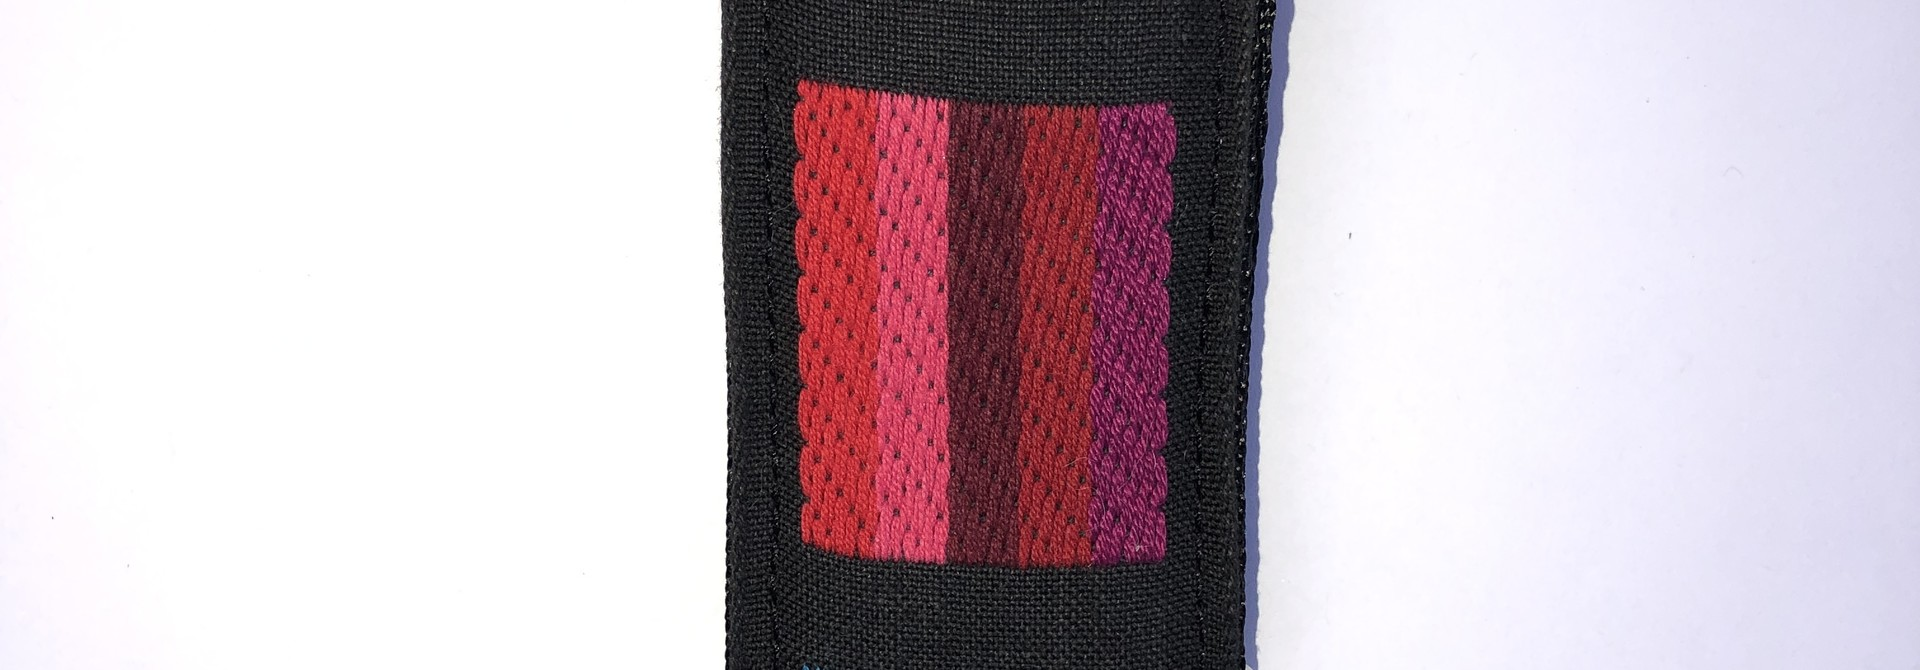 Tremolo Leather Co. Abstract Color Bars Strap